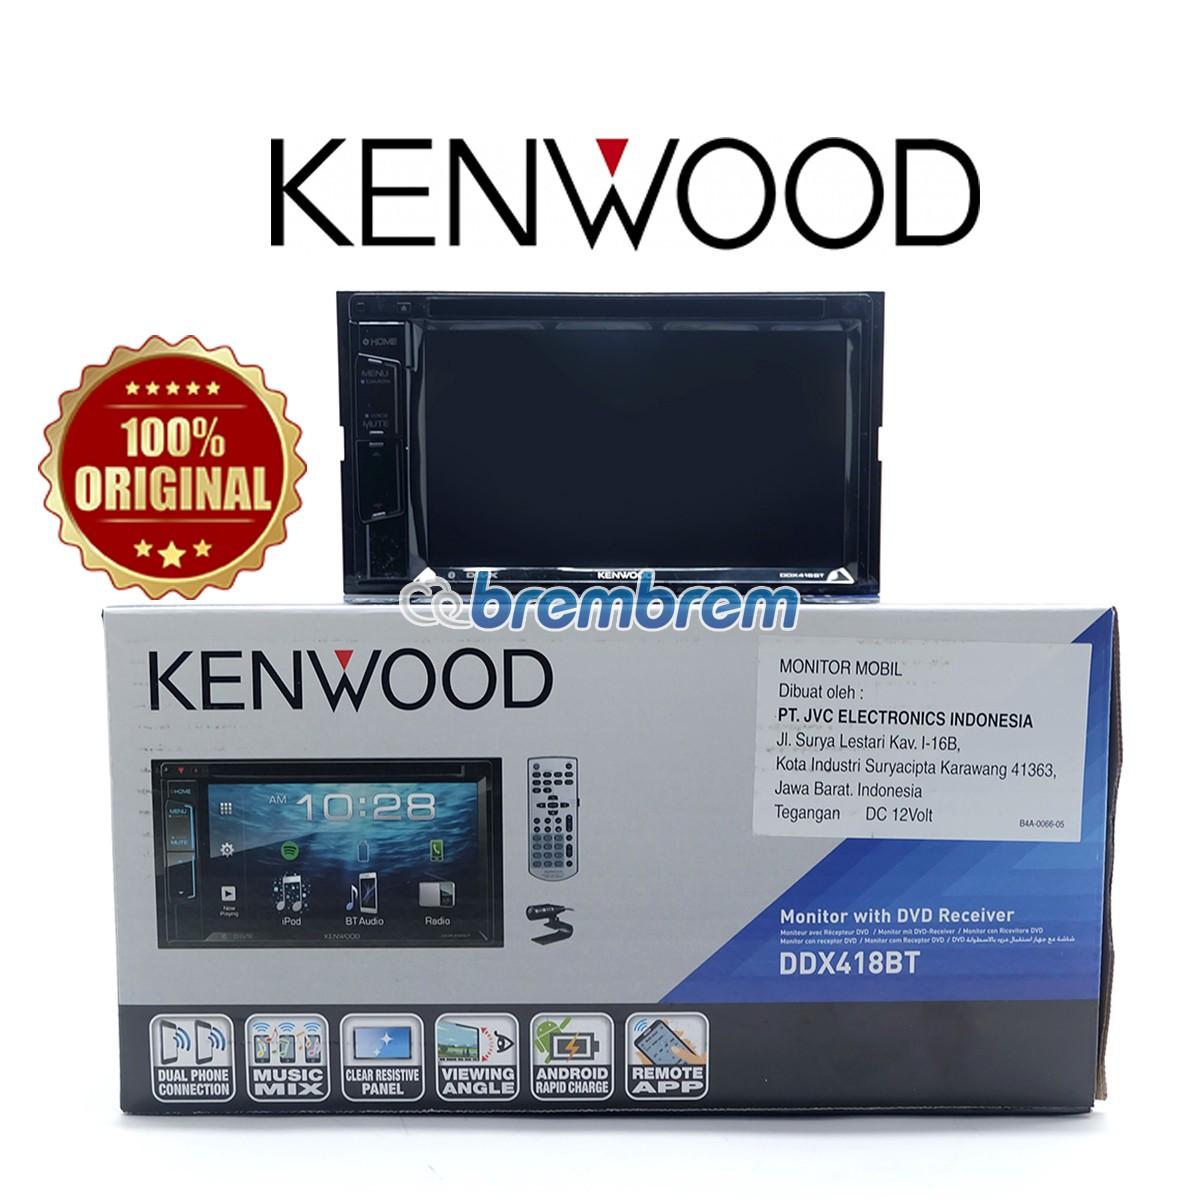 KENWOOD DDX418BT - HEADUNIT DOUBLE DIN